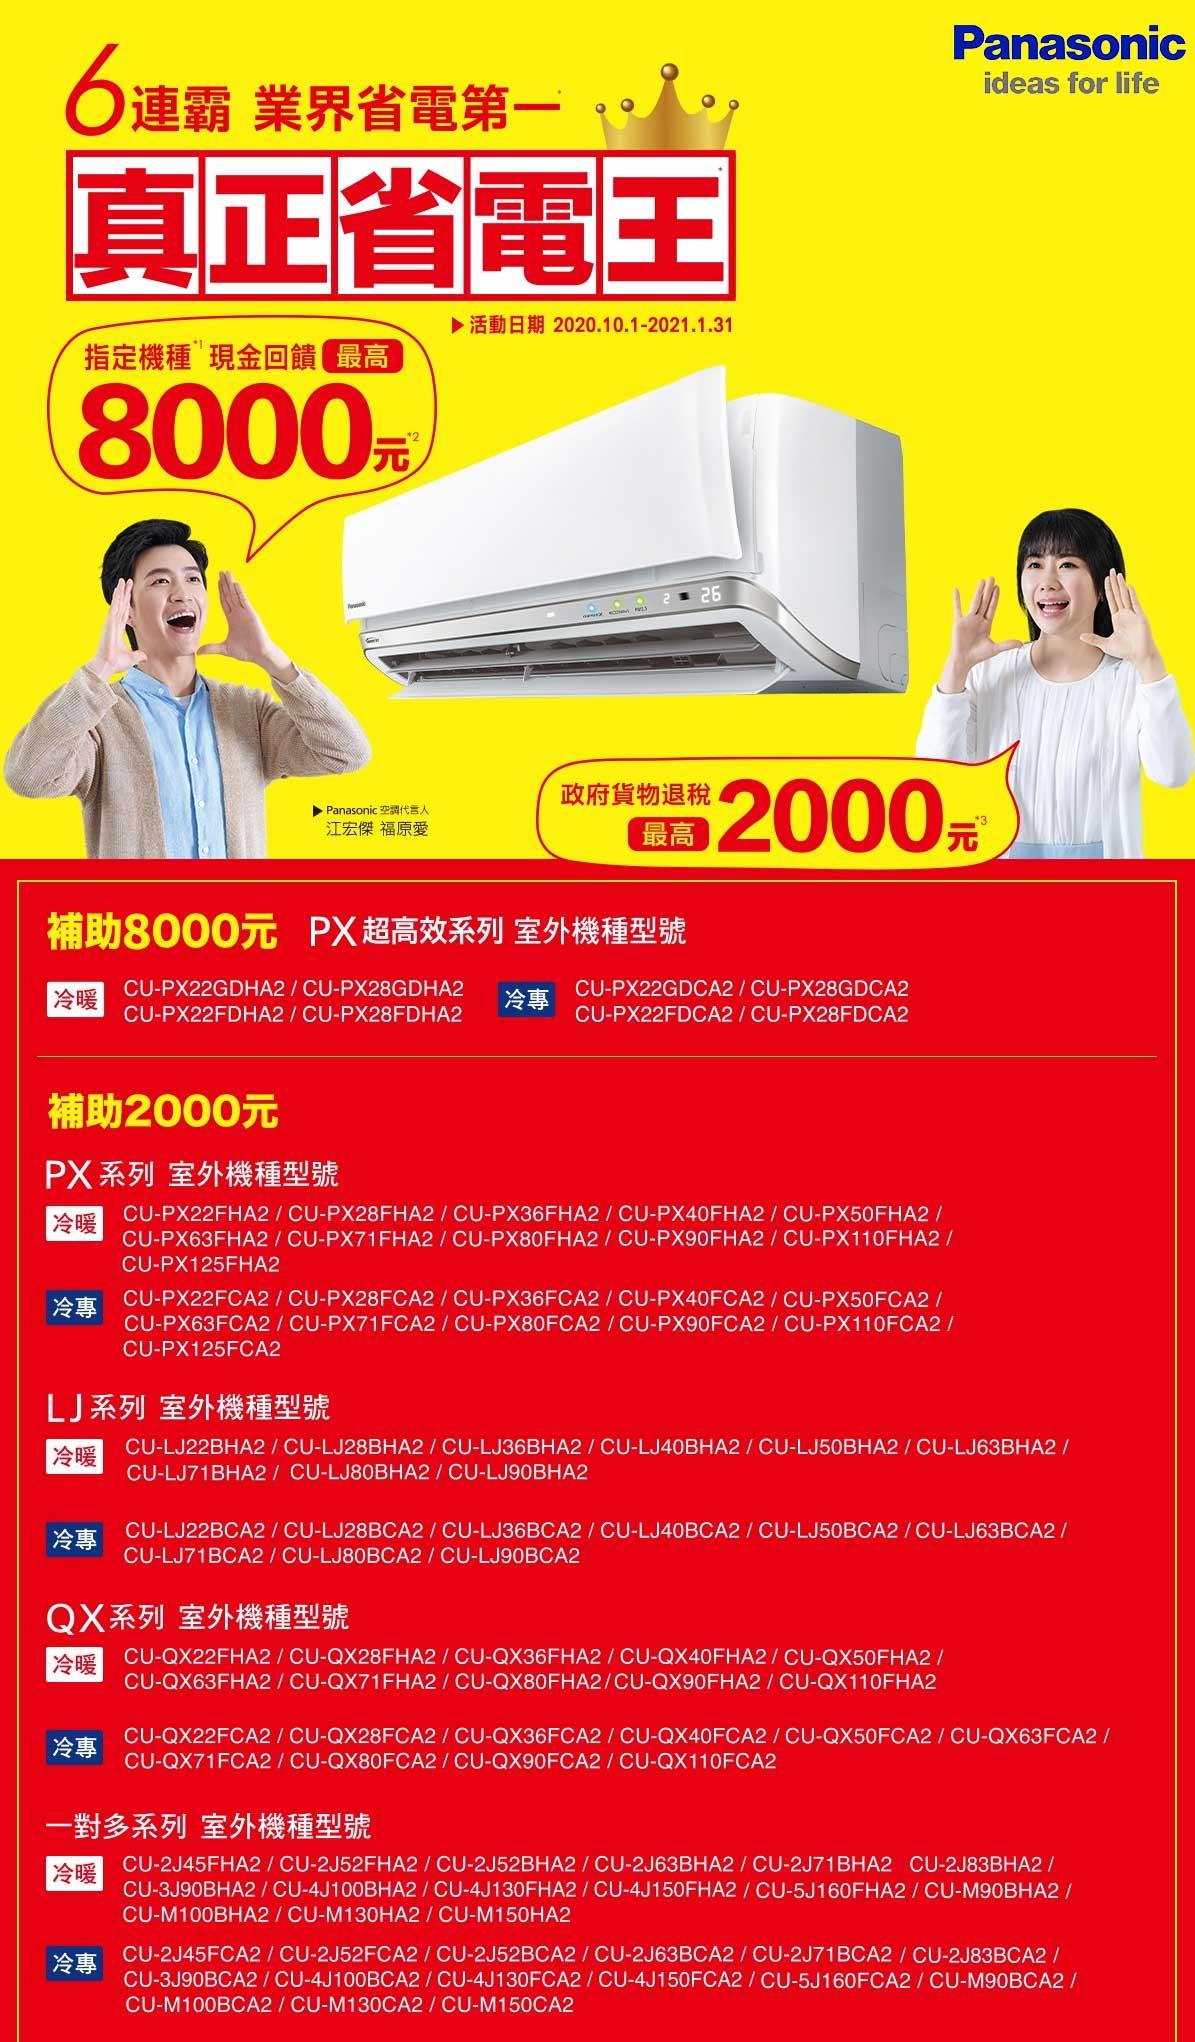 2020 Panasonic 空調 現金回饋